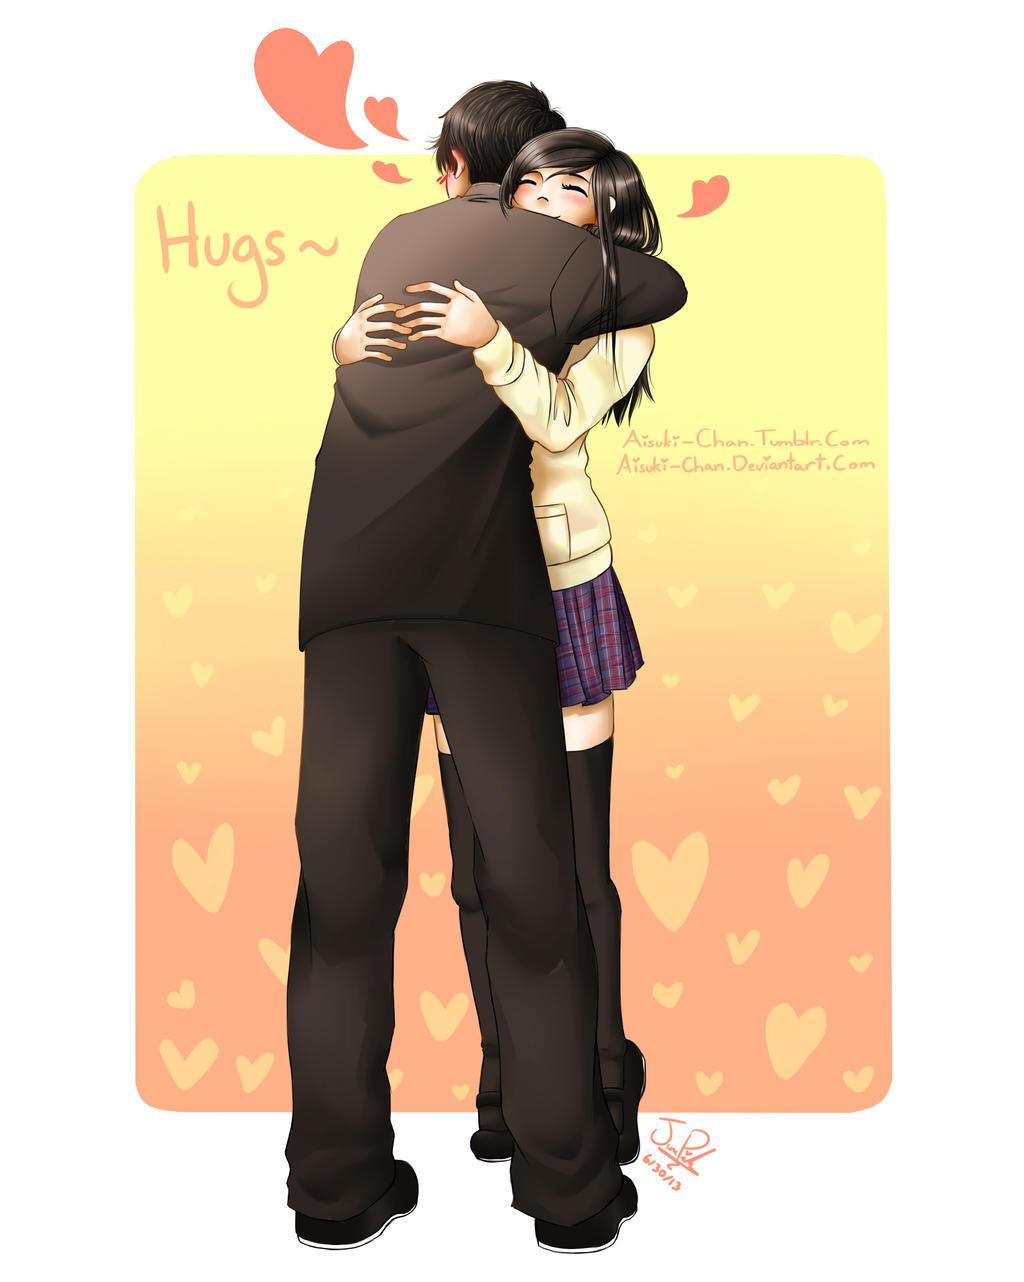 Hugs by Aisuki-Chan